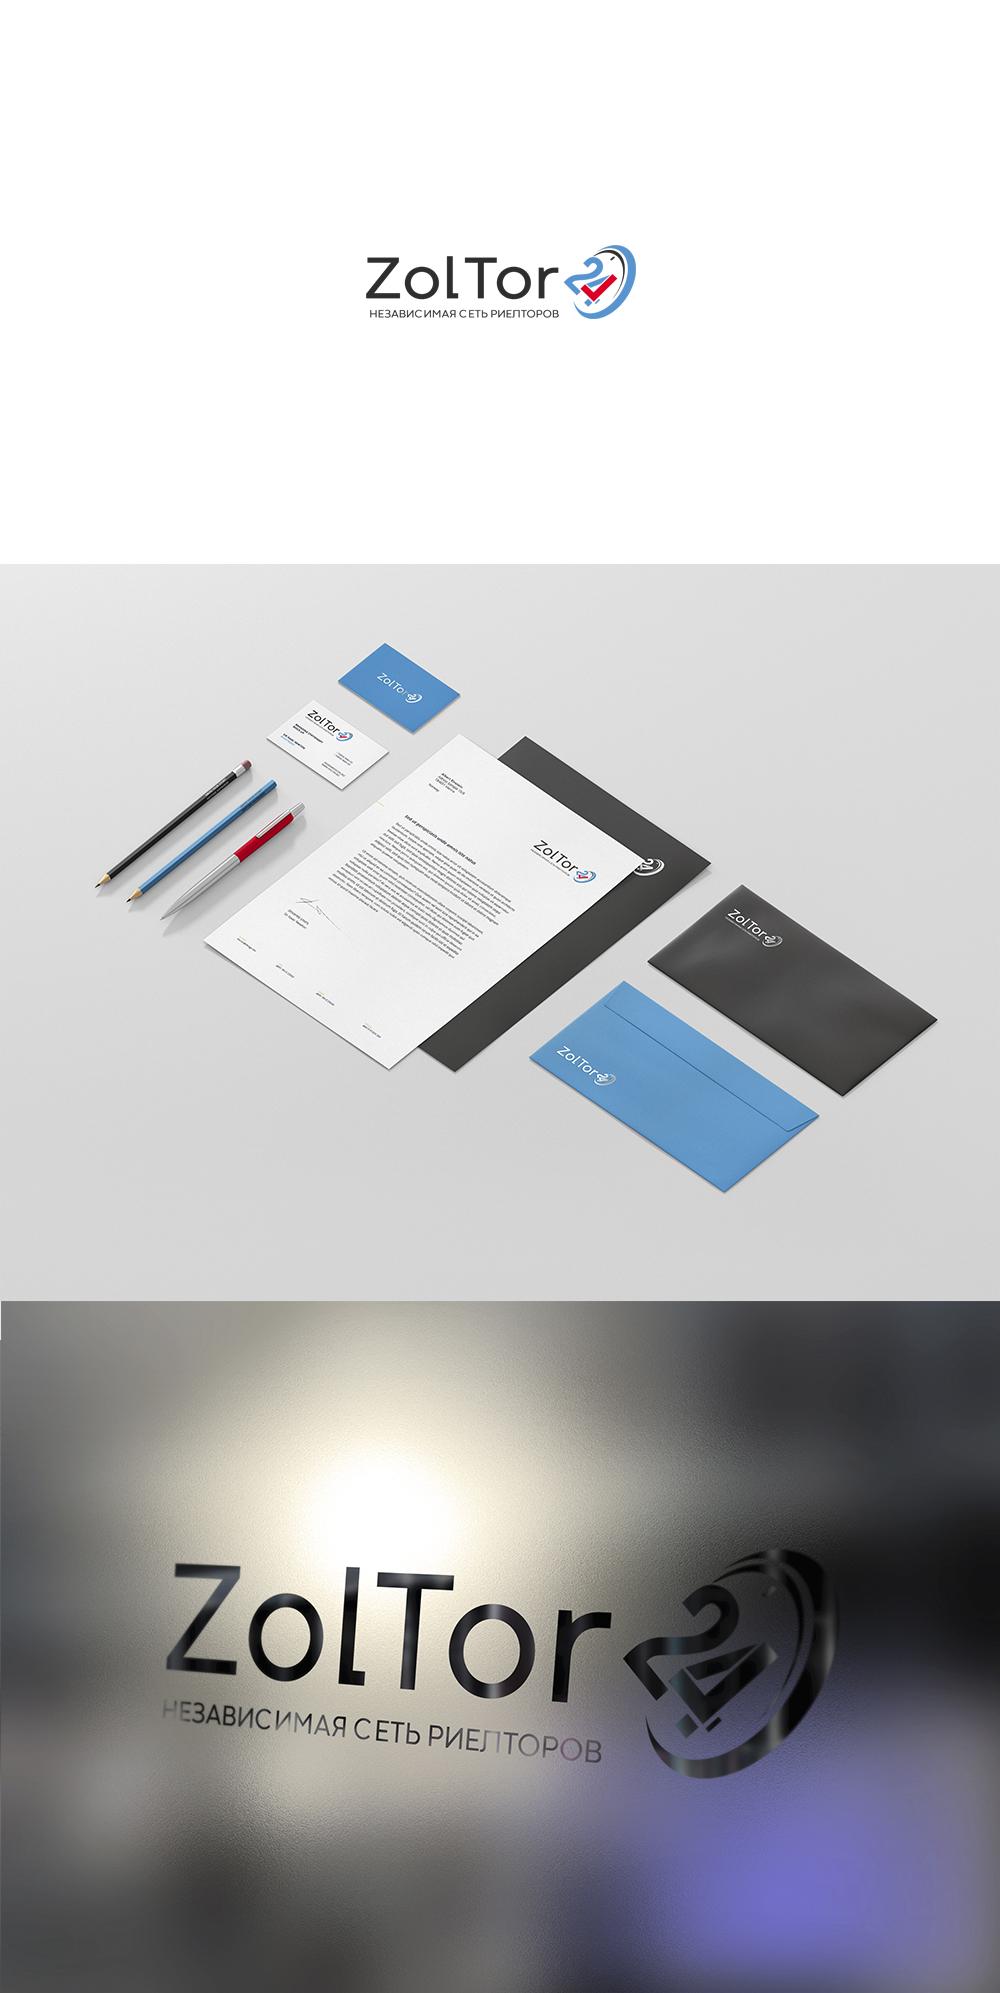 Логотип и фирменный стиль ZolTor24 фото f_8015c93c1c9918e3.jpg